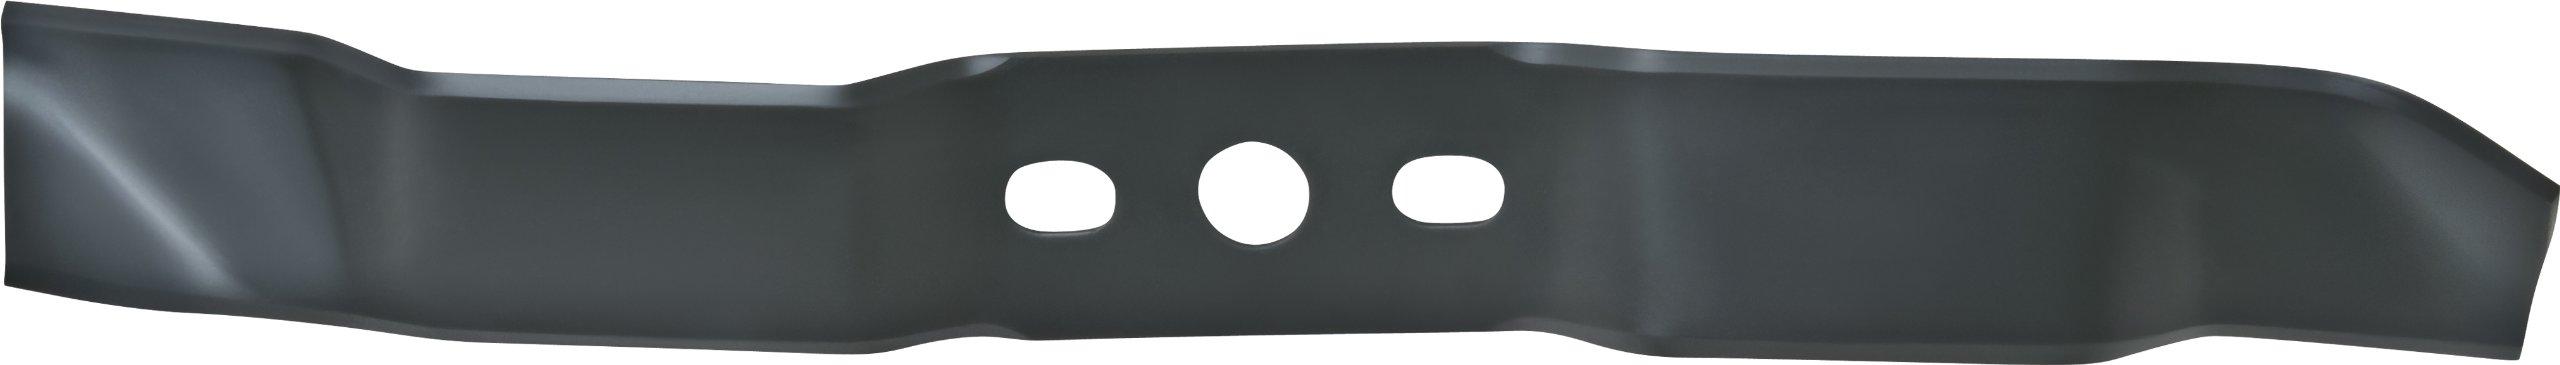 Arnold-Rasenmhermesser-460-mm-passend-fr-AL-KO-Rasenmher-1111-A2-0002